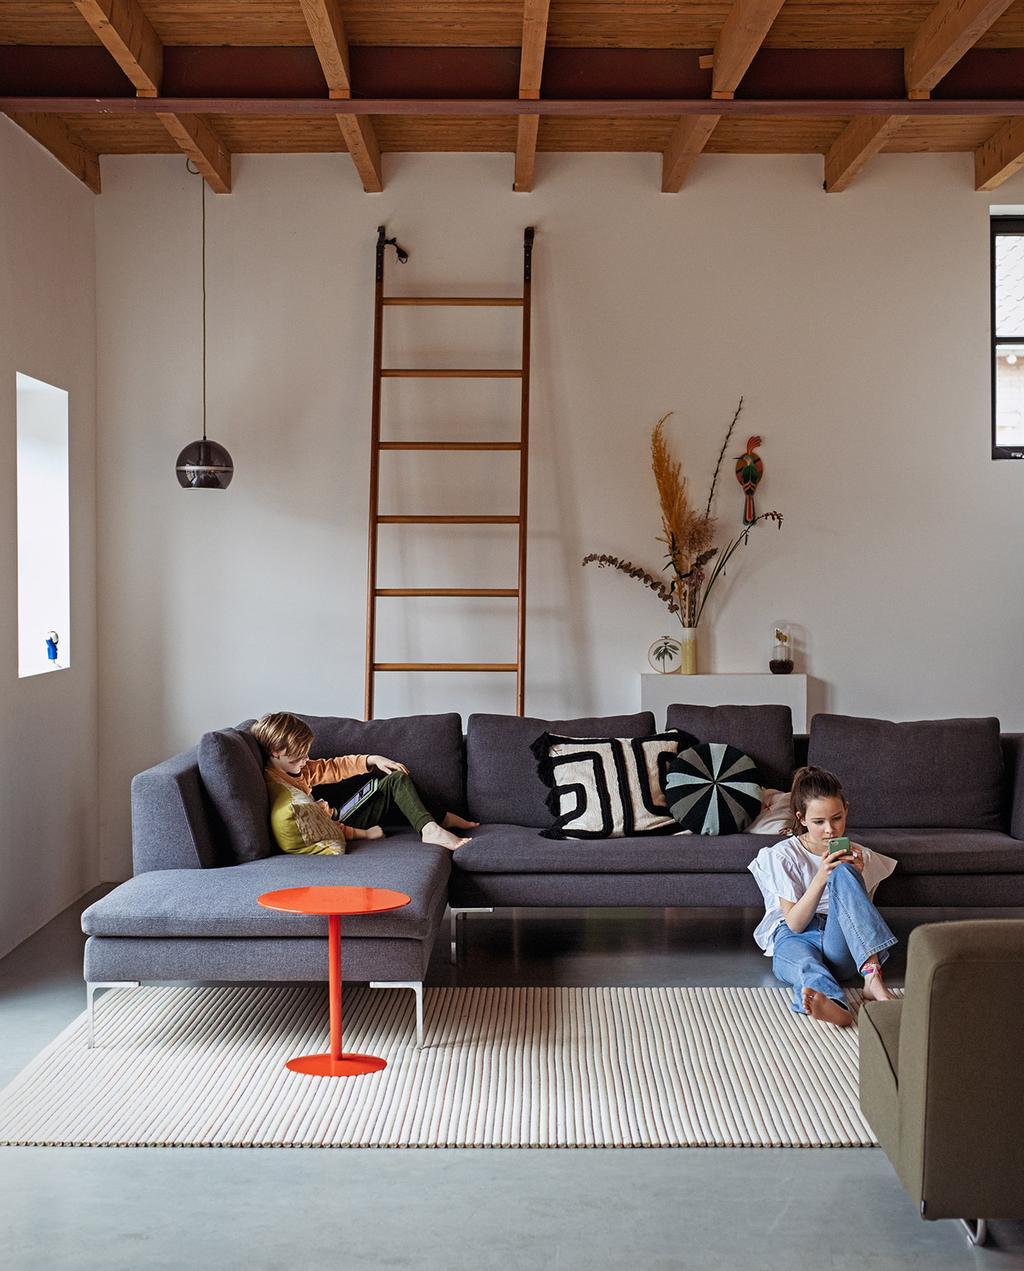 vtwonen 03-2021 | grijze hoekbank in woonkamer ladder tegen muur